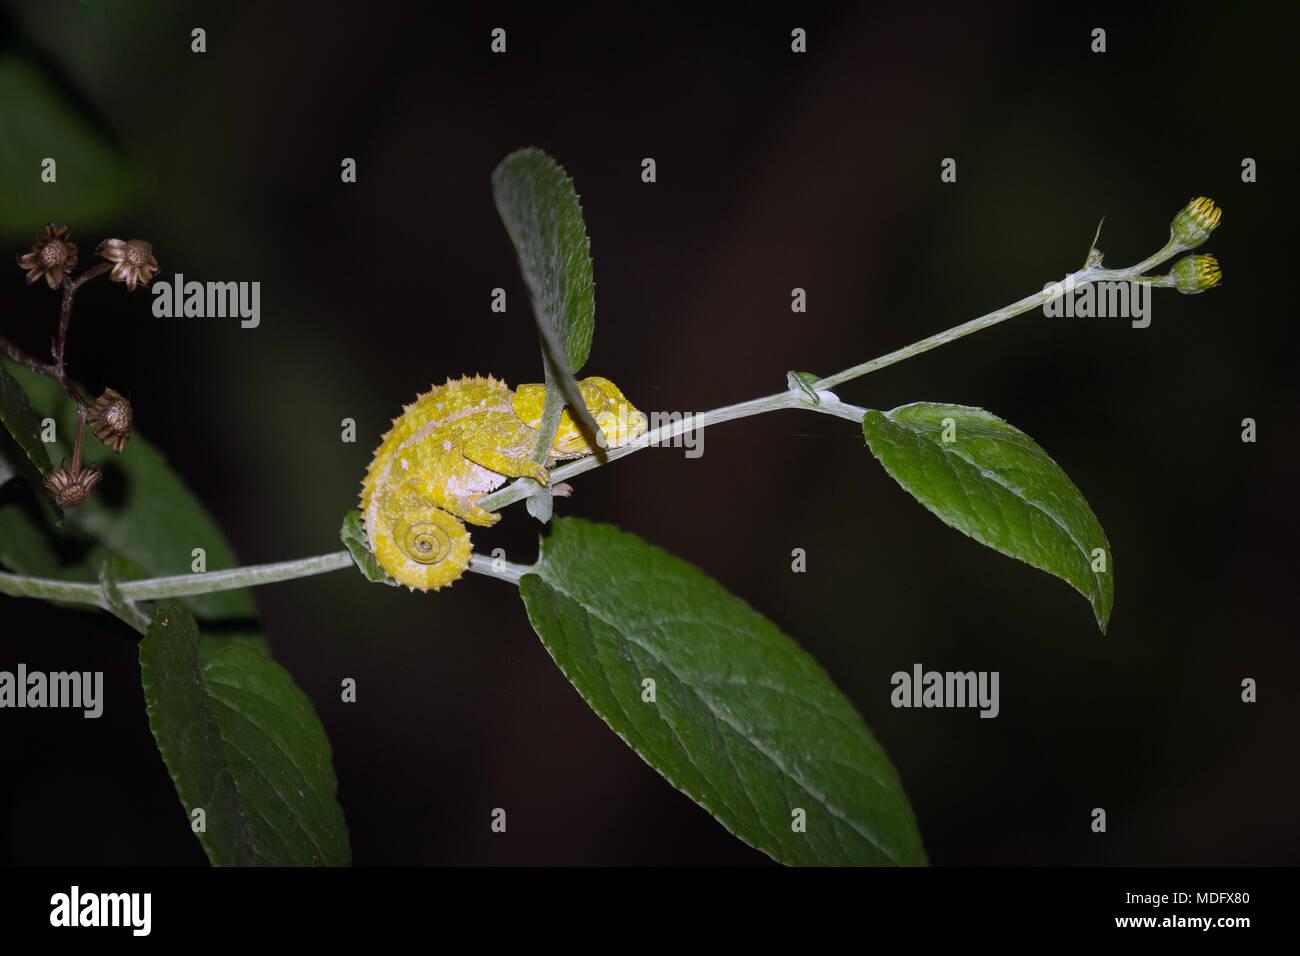 Nose-horned Chameleon (Calumma nasuta), Ranomafana N.P. Madagascar. - Stock Image